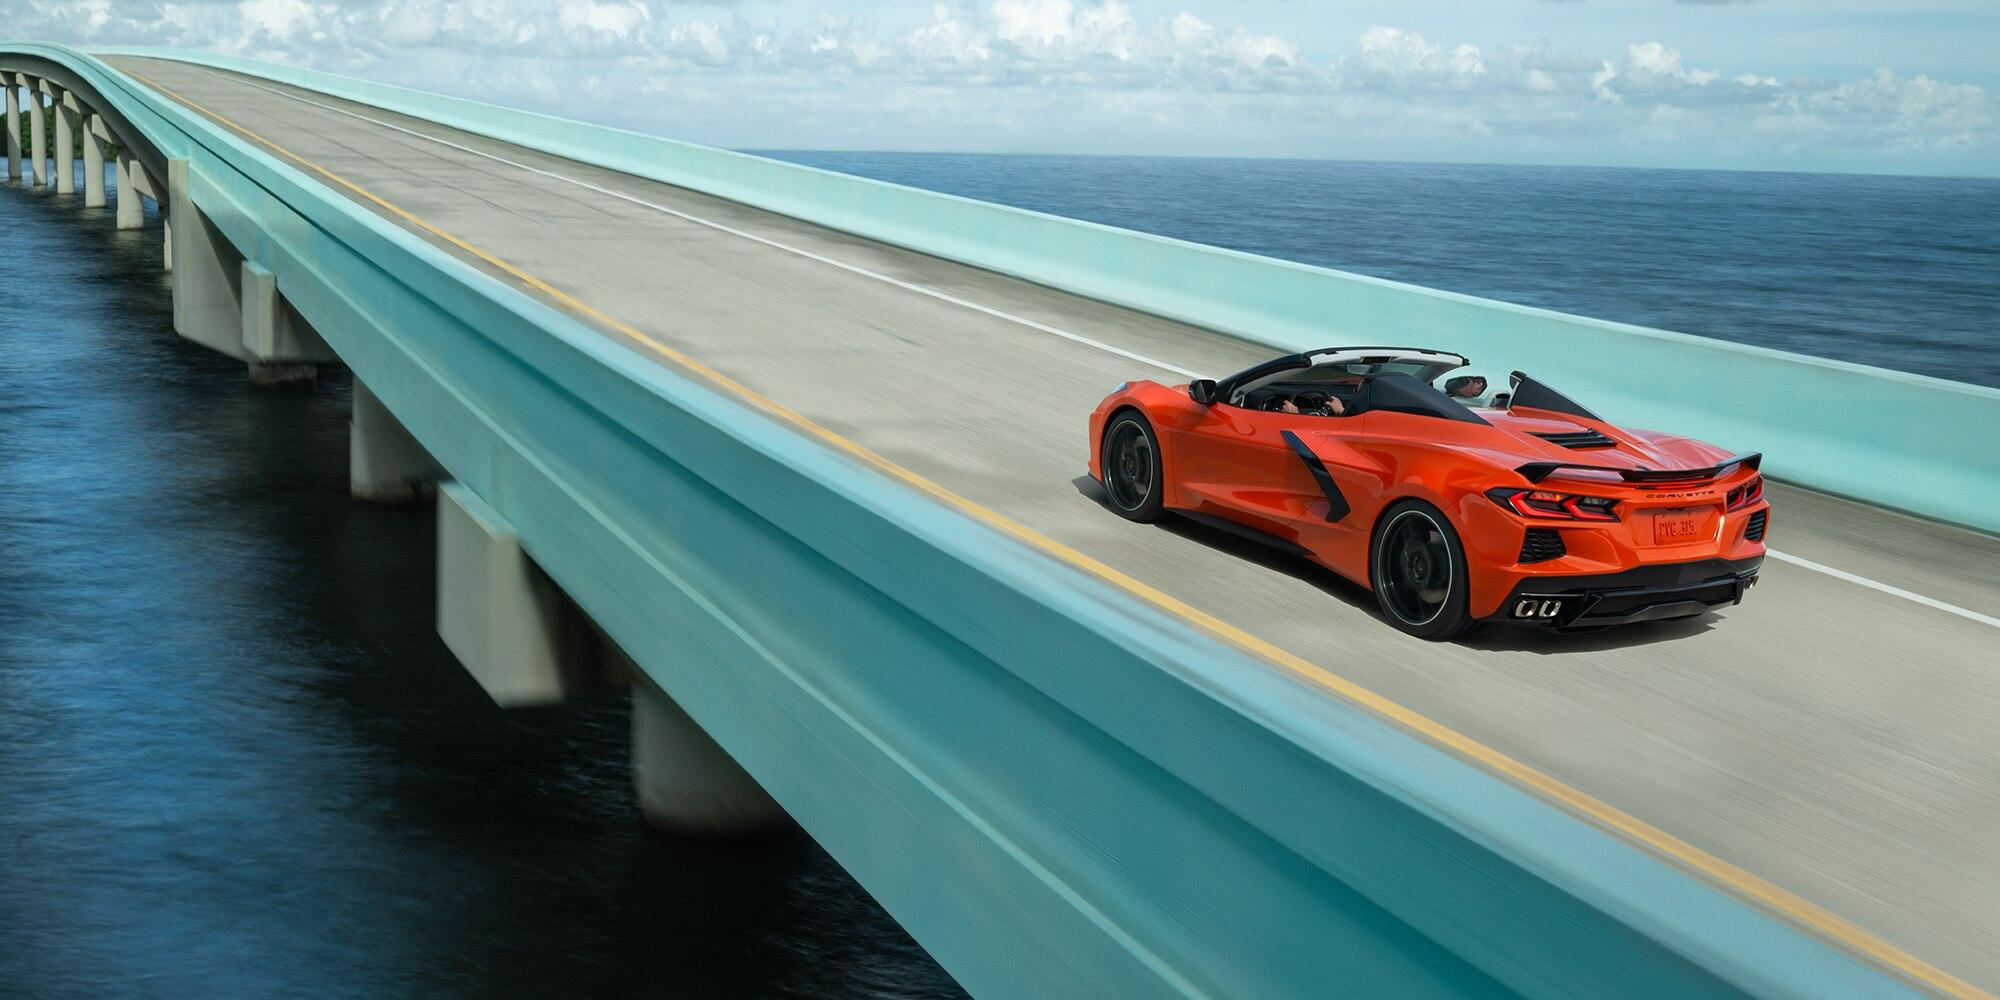 2021 Chevrolet Corvette Stingray: Car and Driver 10Best